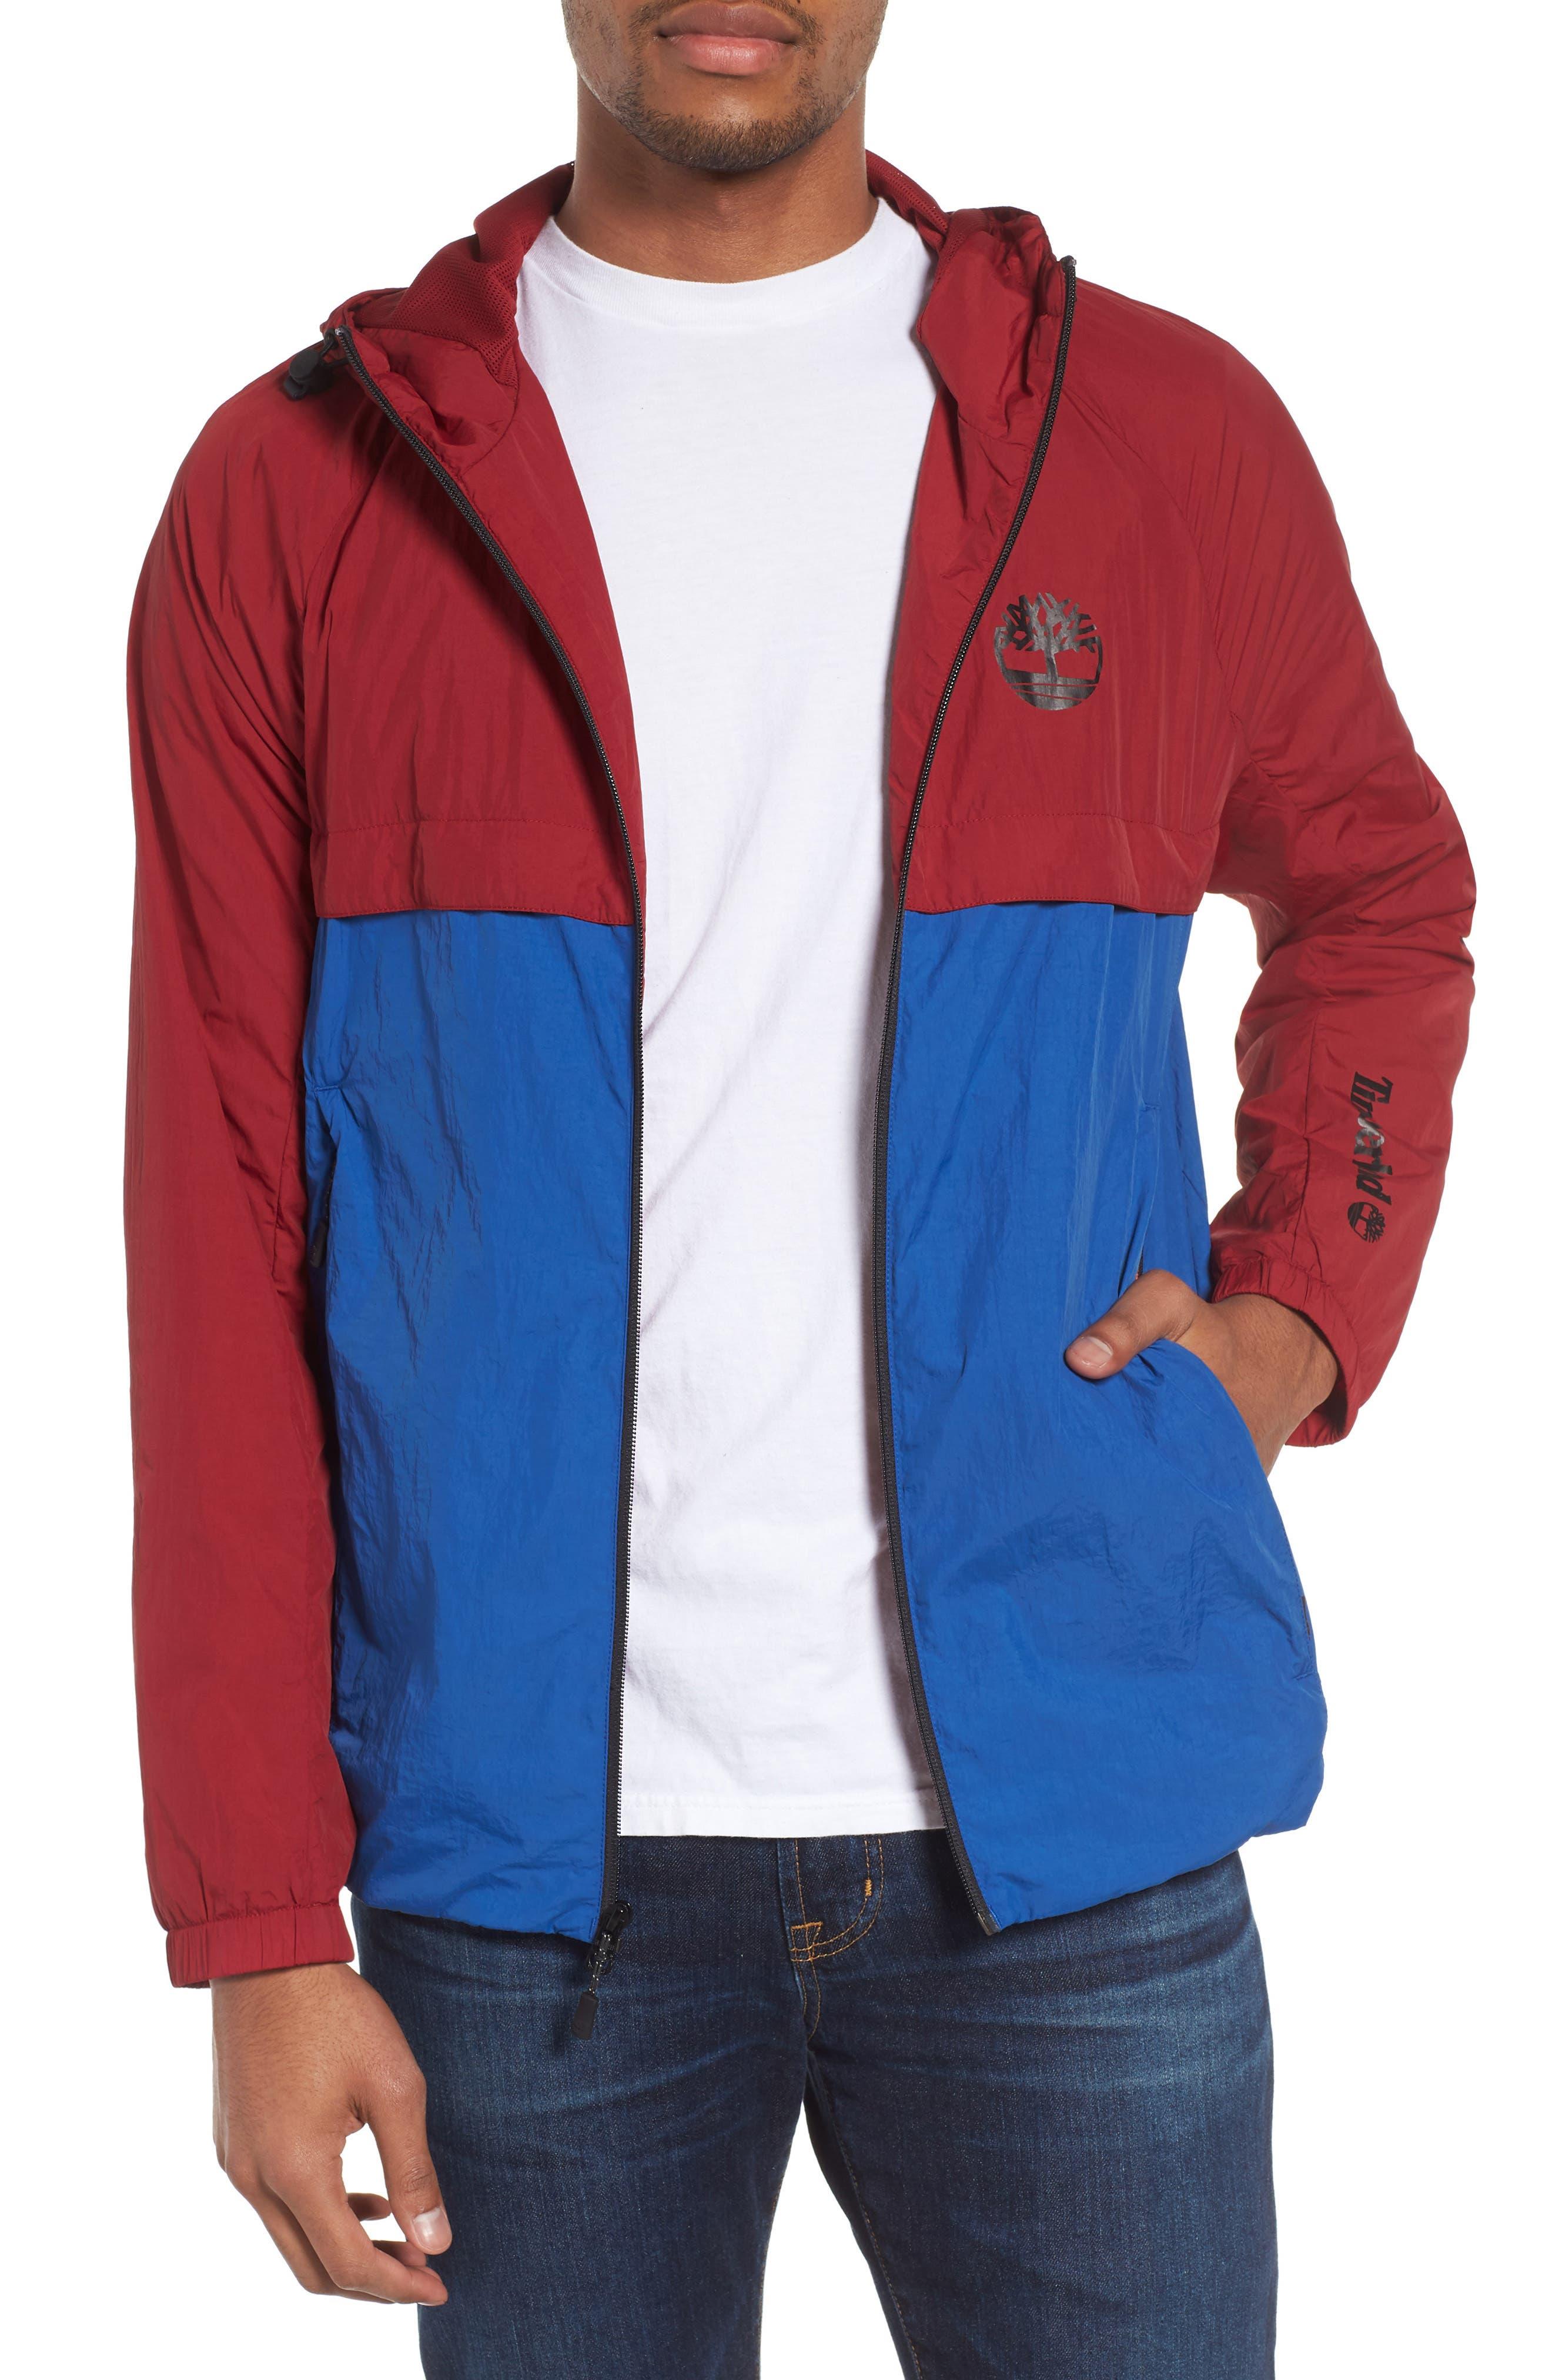 Timberland Camo Windbreaker Jacket